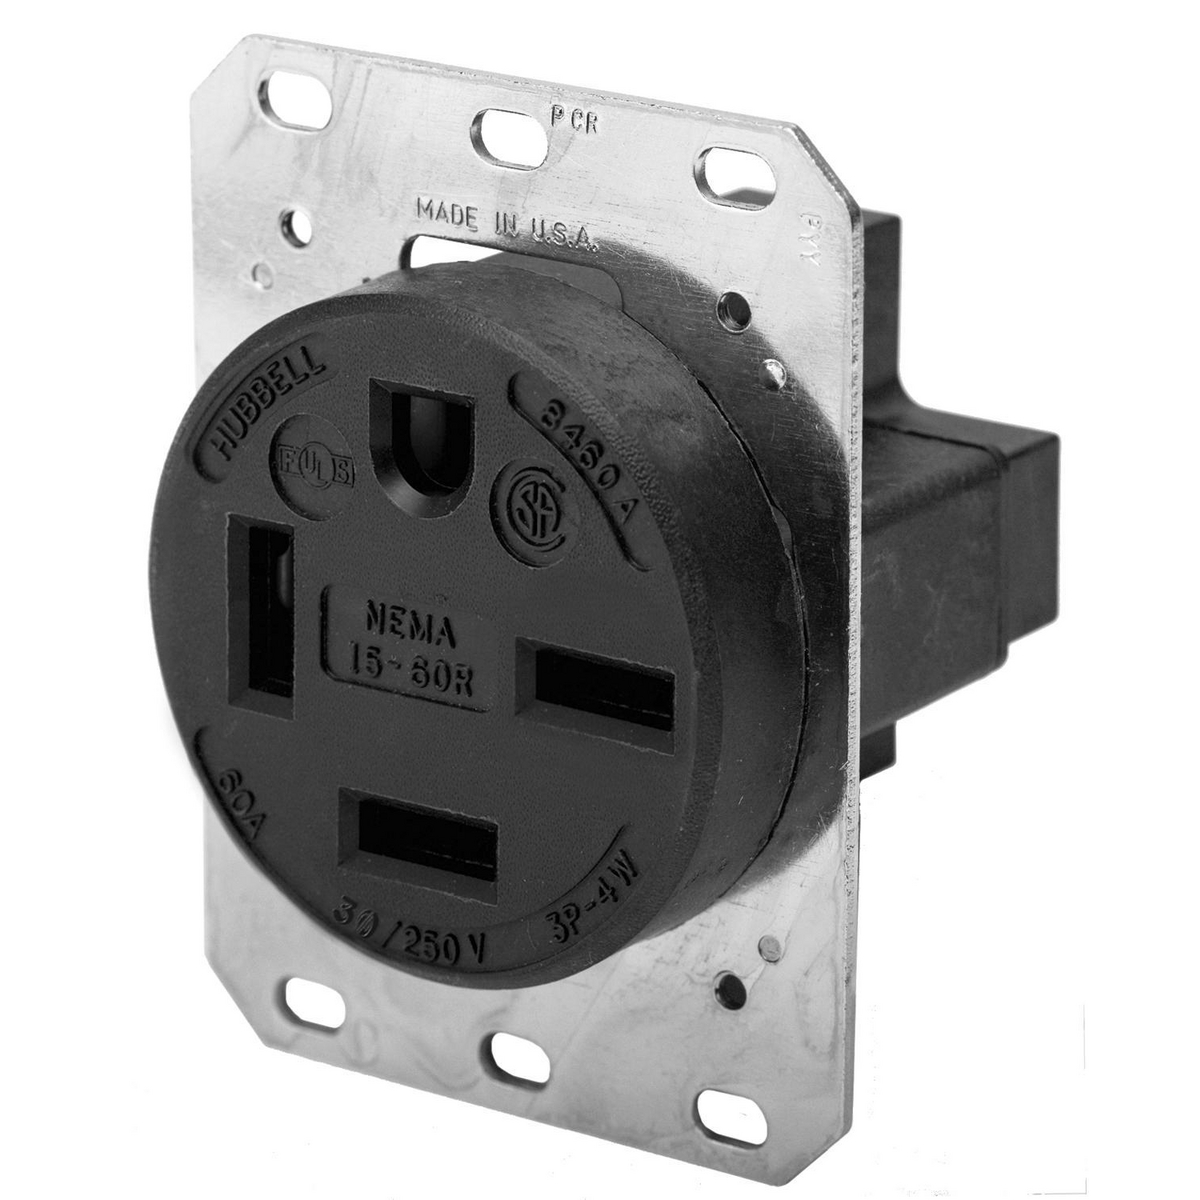 Hubbell HBL8460A 60 Amp 250 Volt 3-Pole 4-Wire NEMA 15-60R Black Single Straight Blade Receptacle